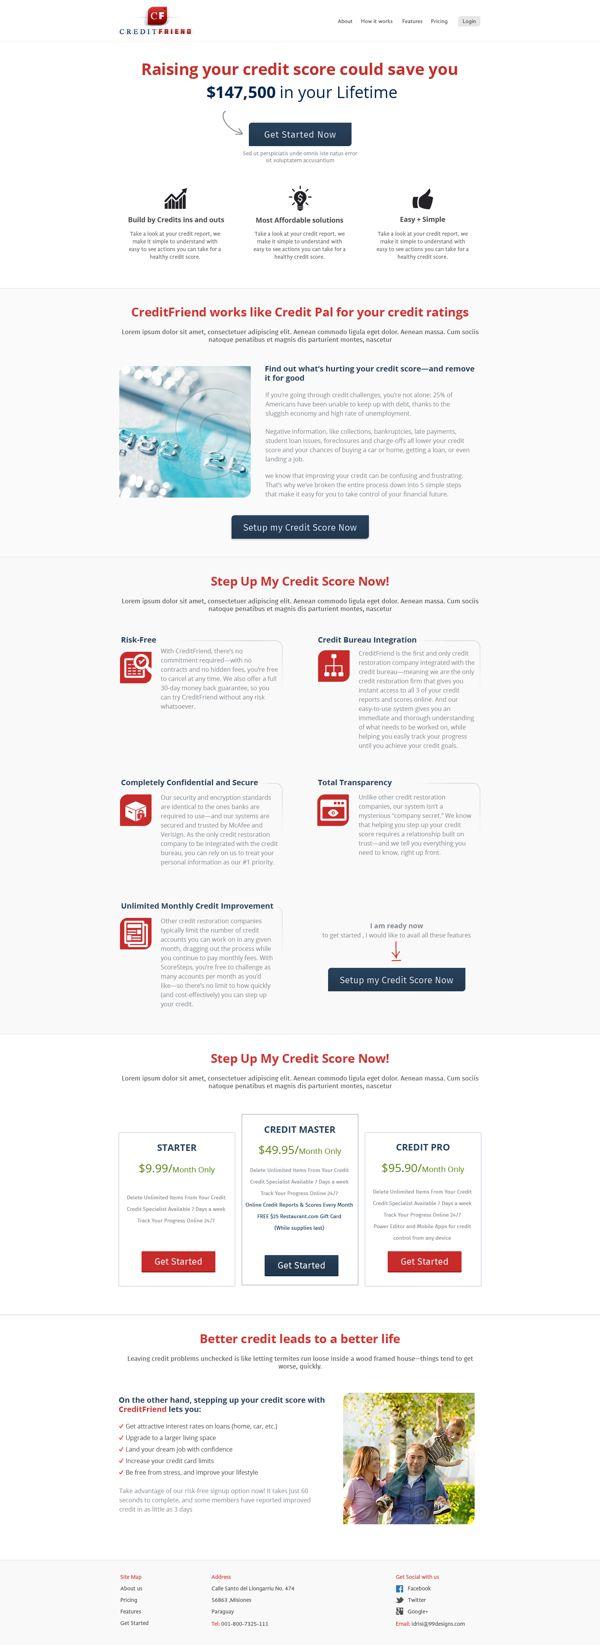 CreditFriend.com Web Design Contest by Ahsan Idrisi, via Behance